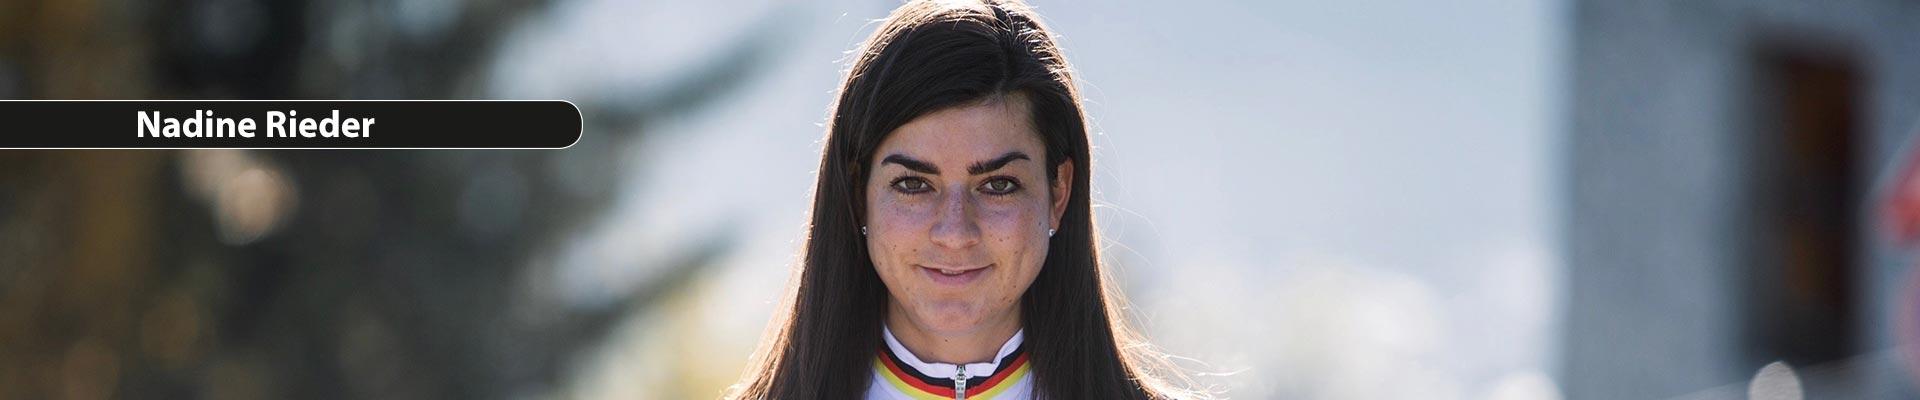 Nadine Rieder